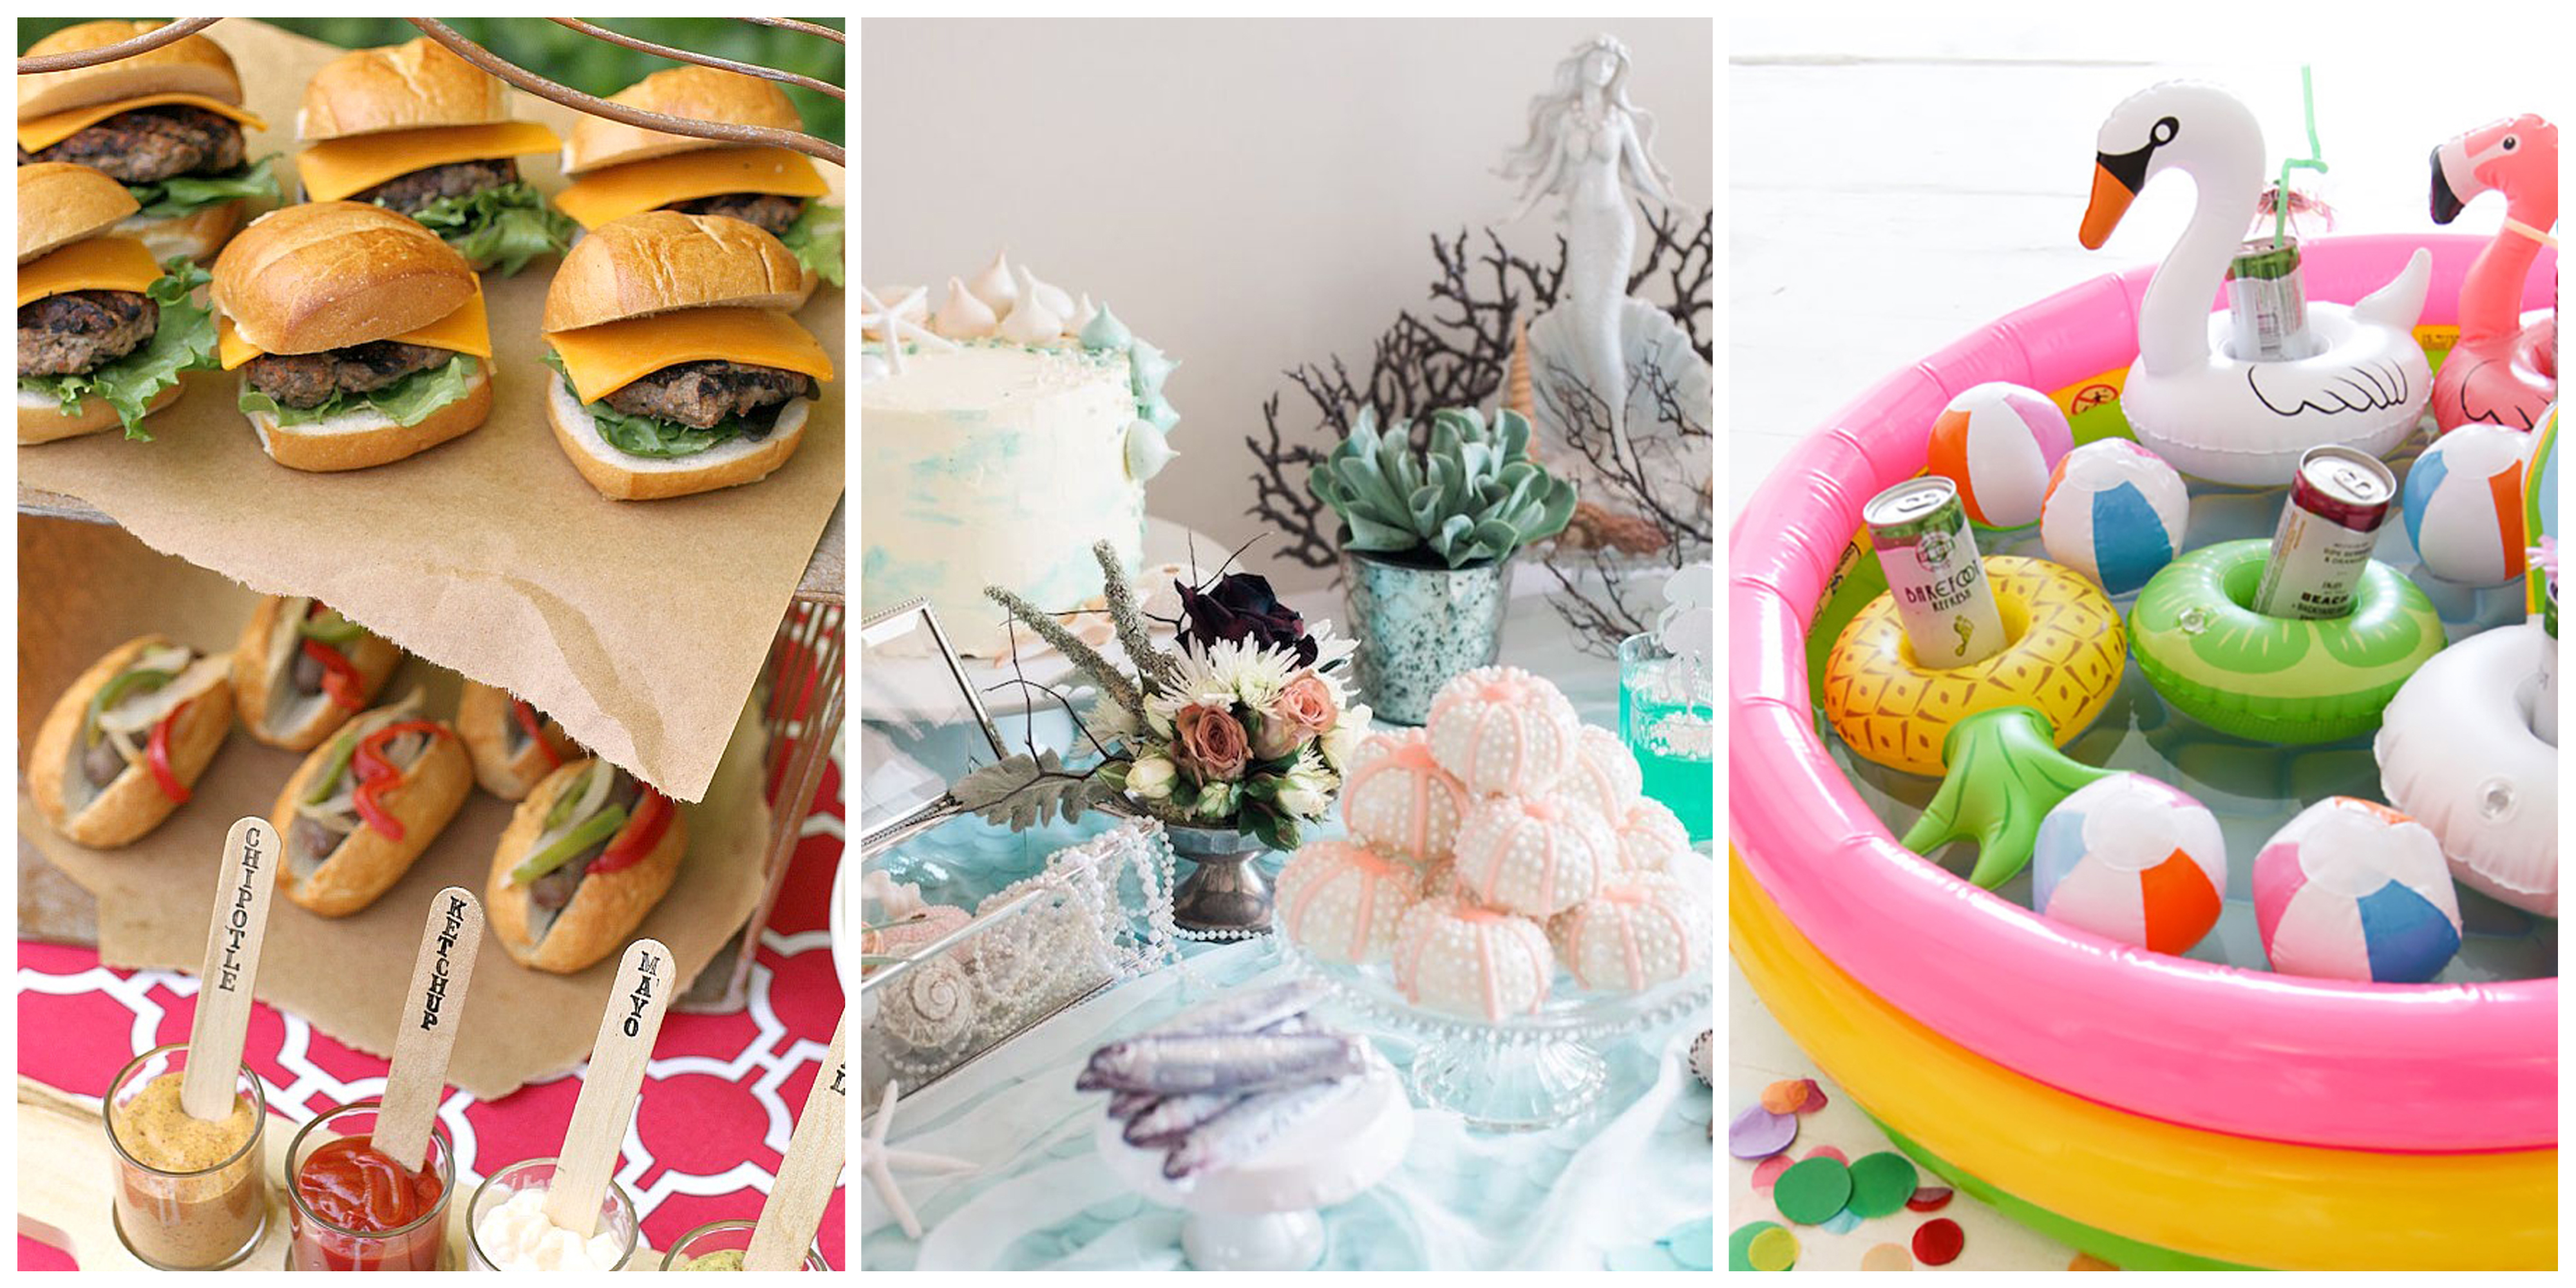 Summer Party Ideas - Summer Entertaining Decorations